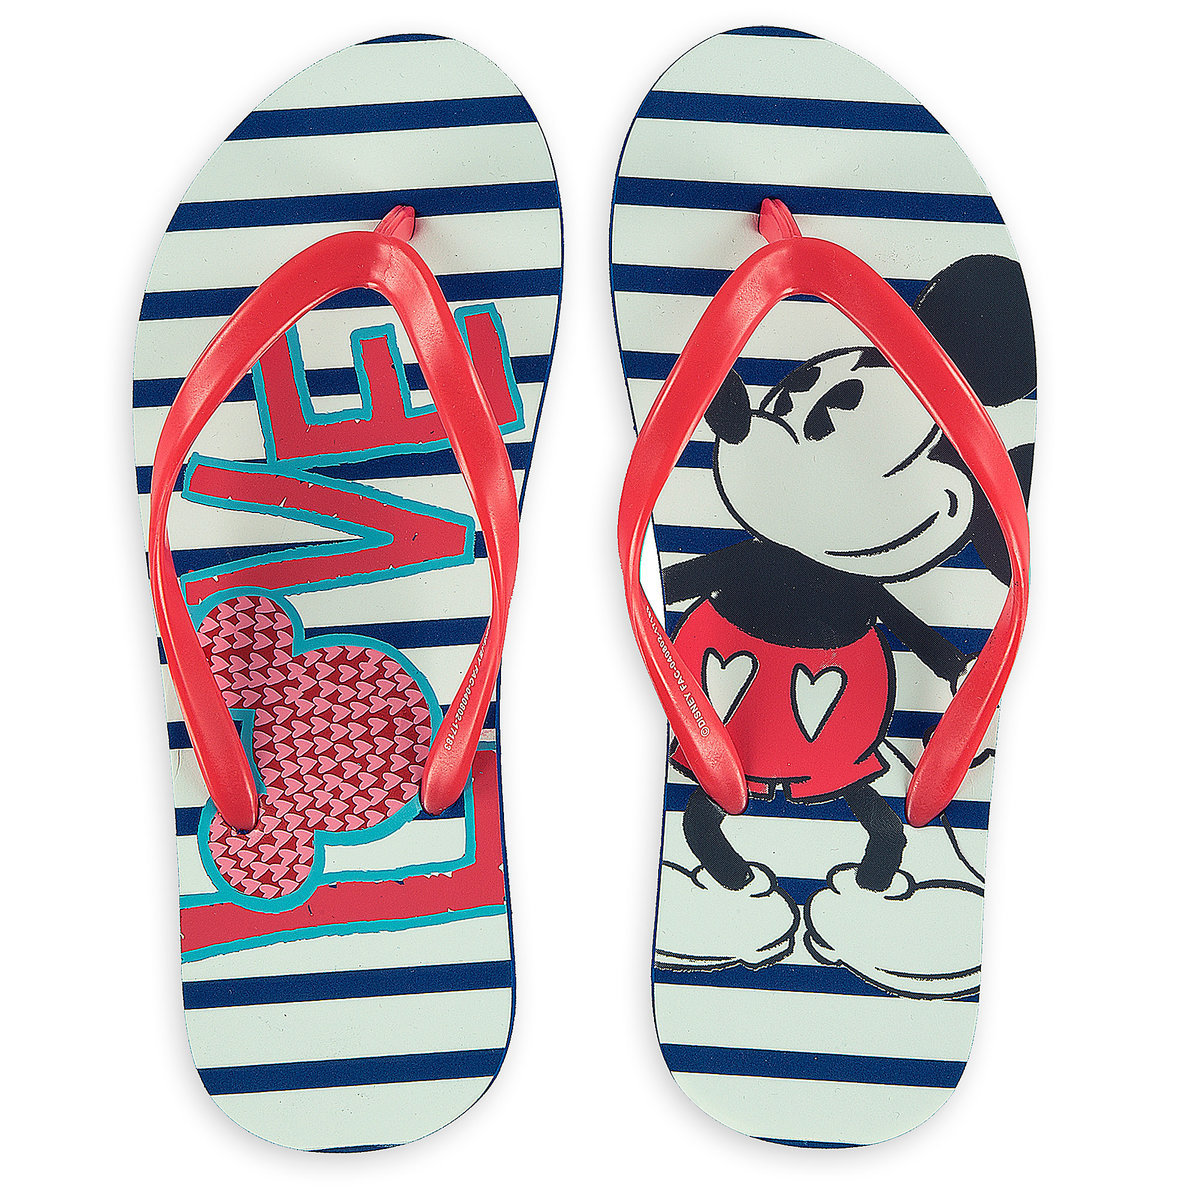 09bc117e784 Add to My Lists. Disney Adult Flip Flops ...